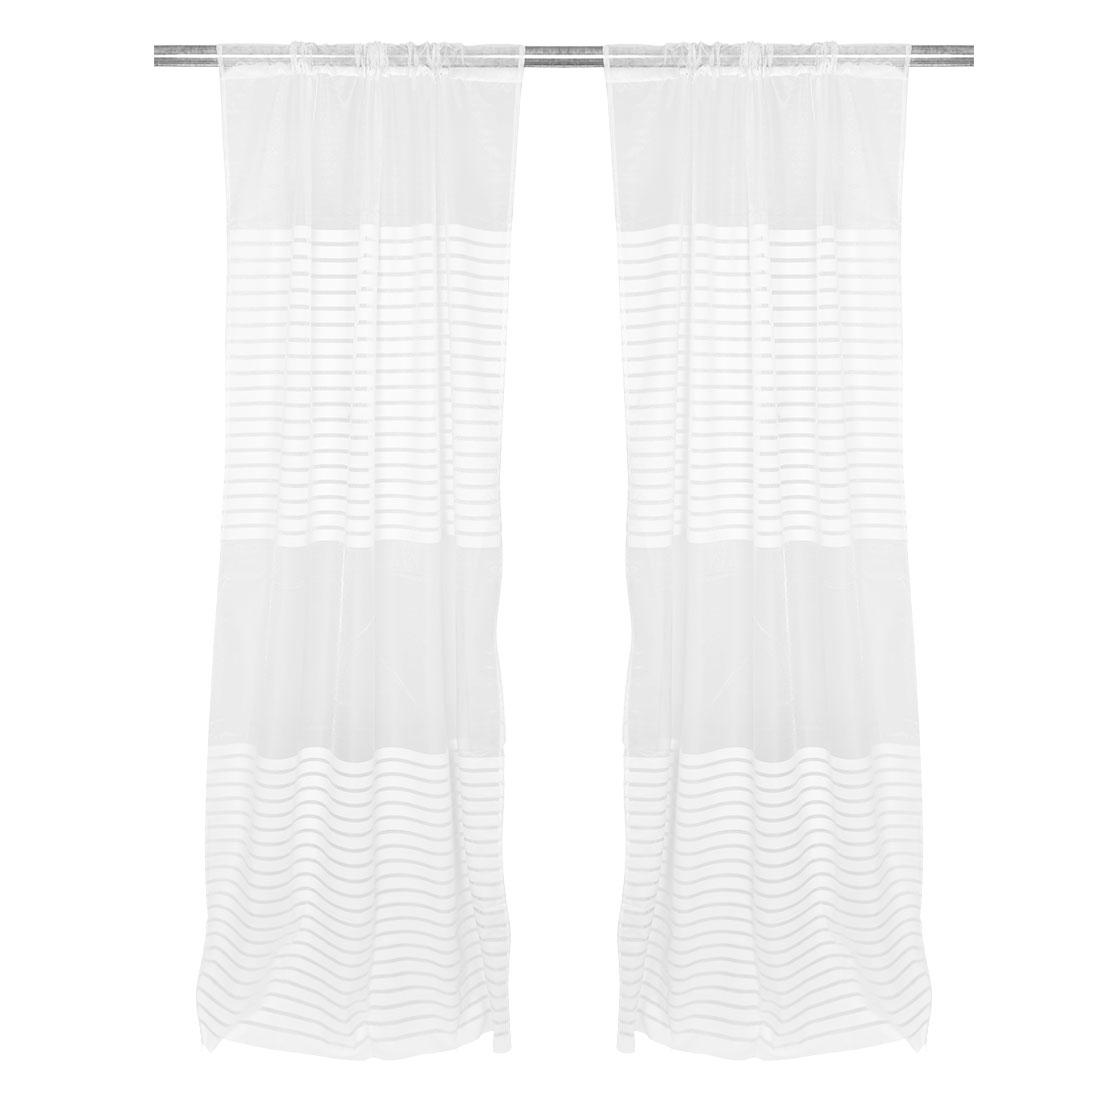 Household Stripe Pattern Decorative Panel Window Sheer Curtain White 100 x 200cm